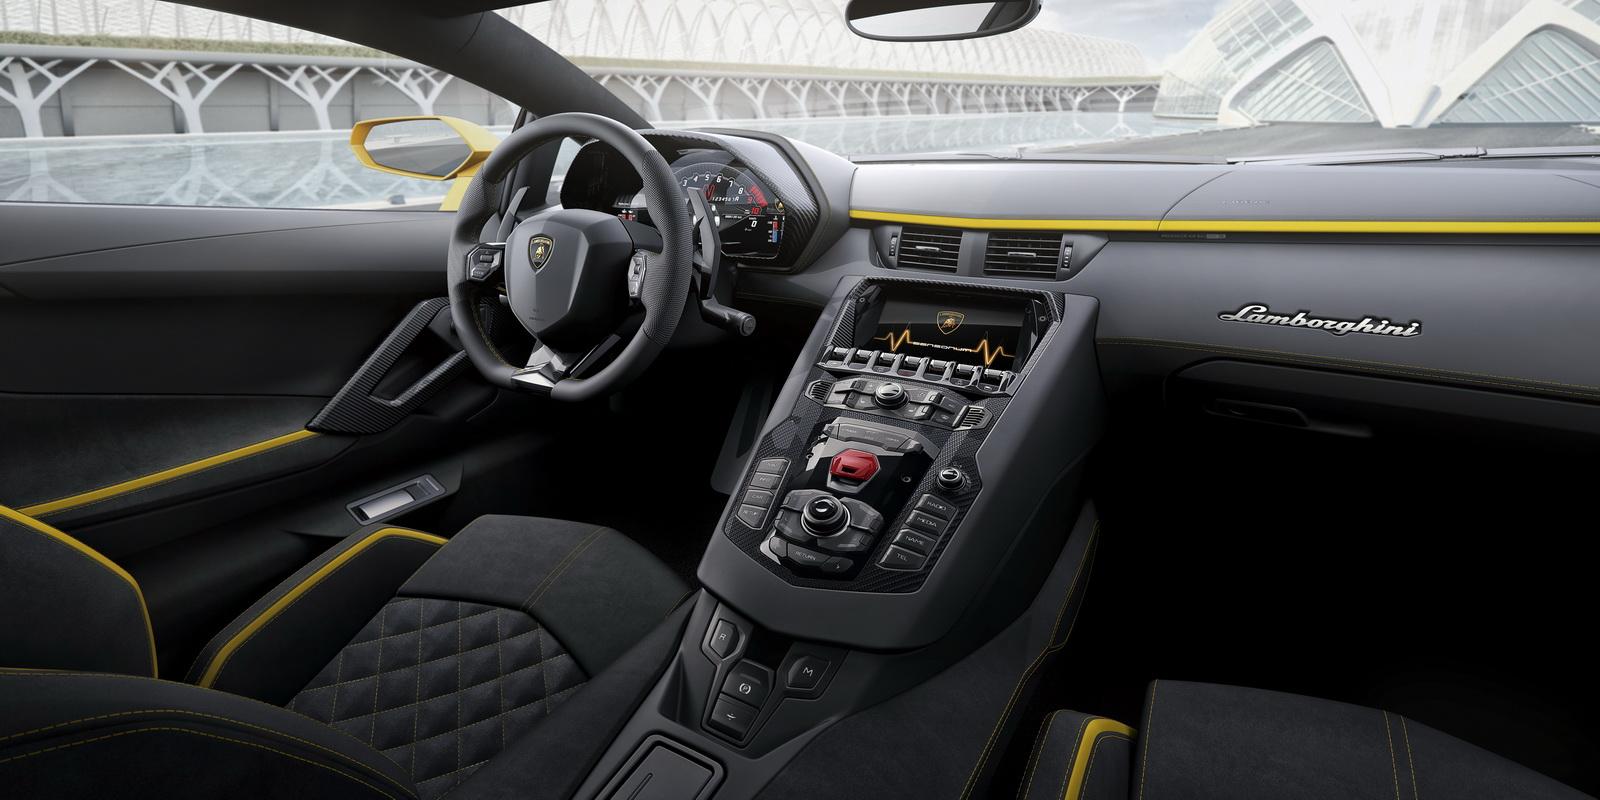 Lamborghini-Aventador-S-Coupé-6